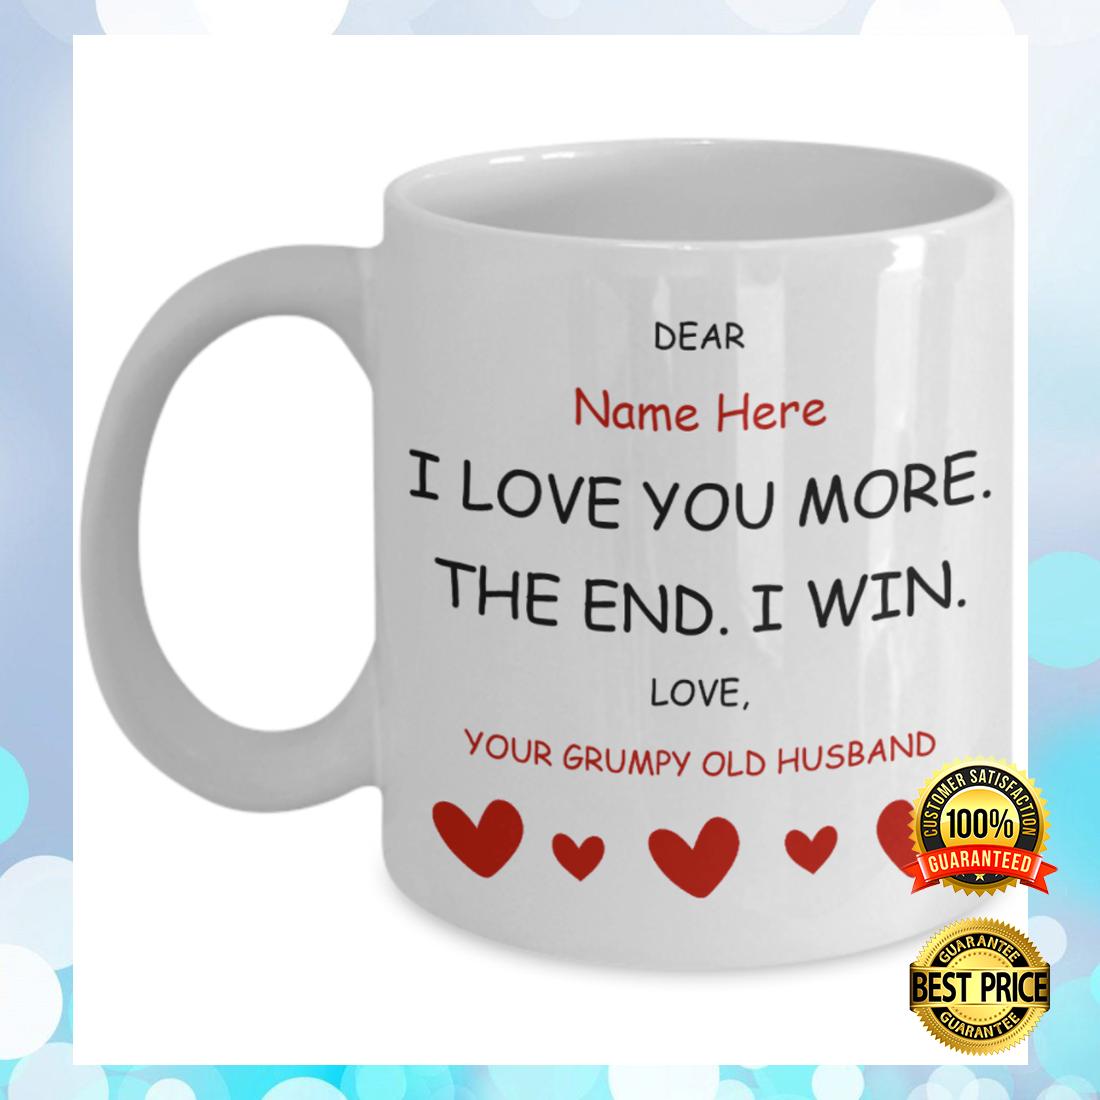 Personalized i love you more the end i win mug 5